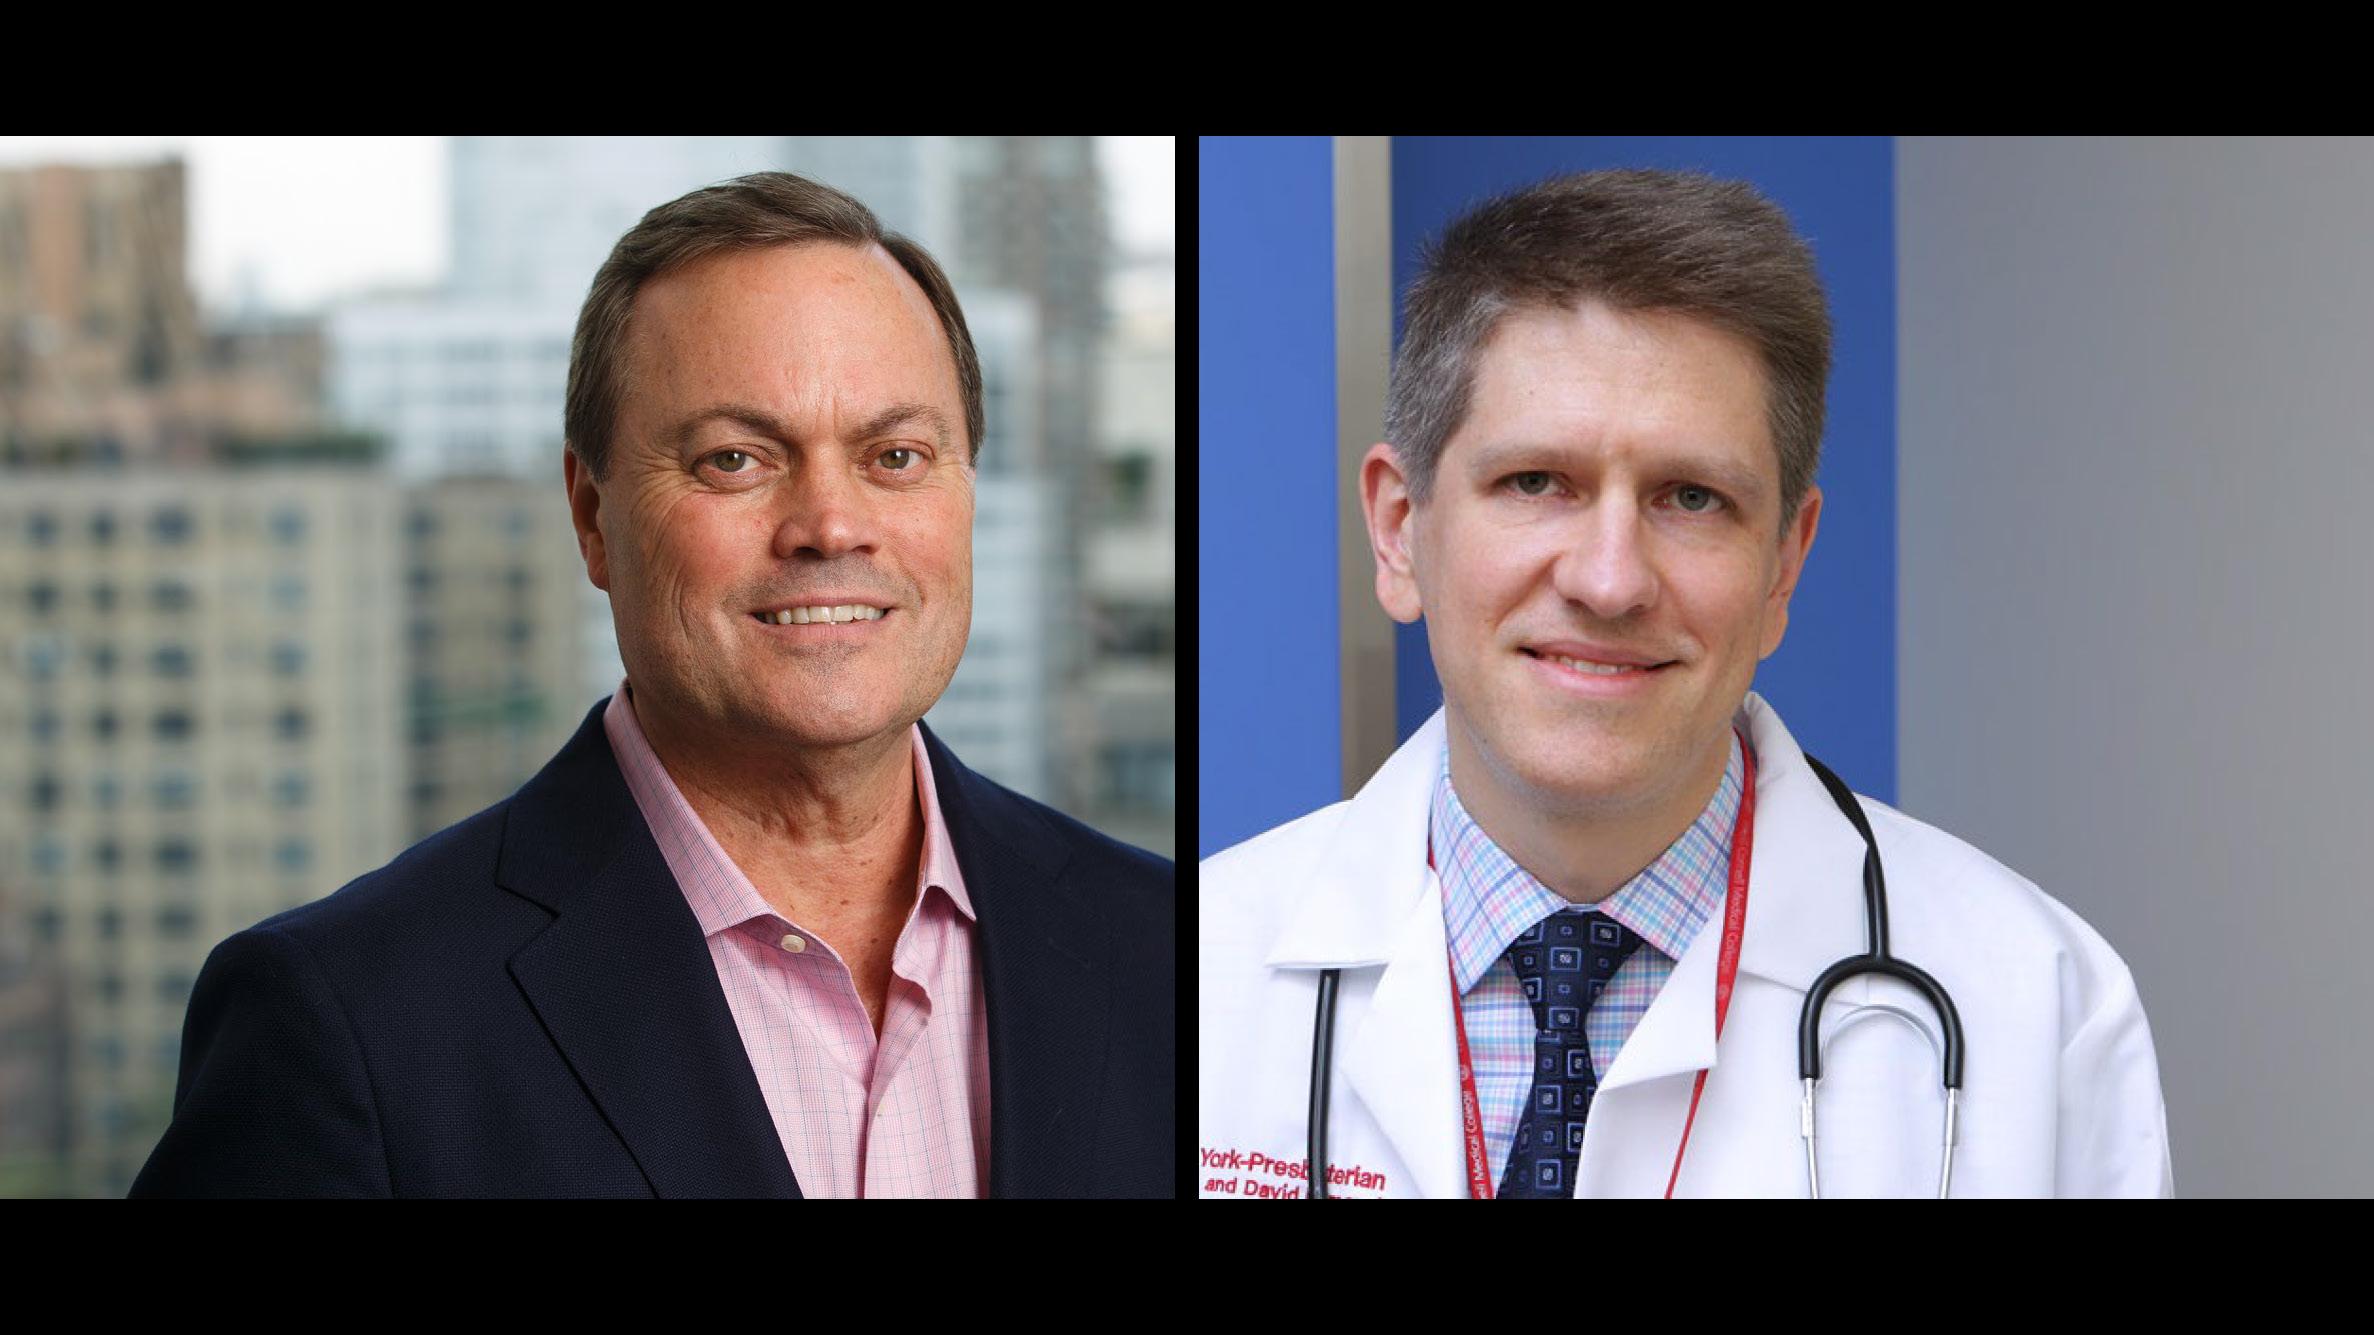 Dr. David Lyden and Dr. Oleh Akchurin